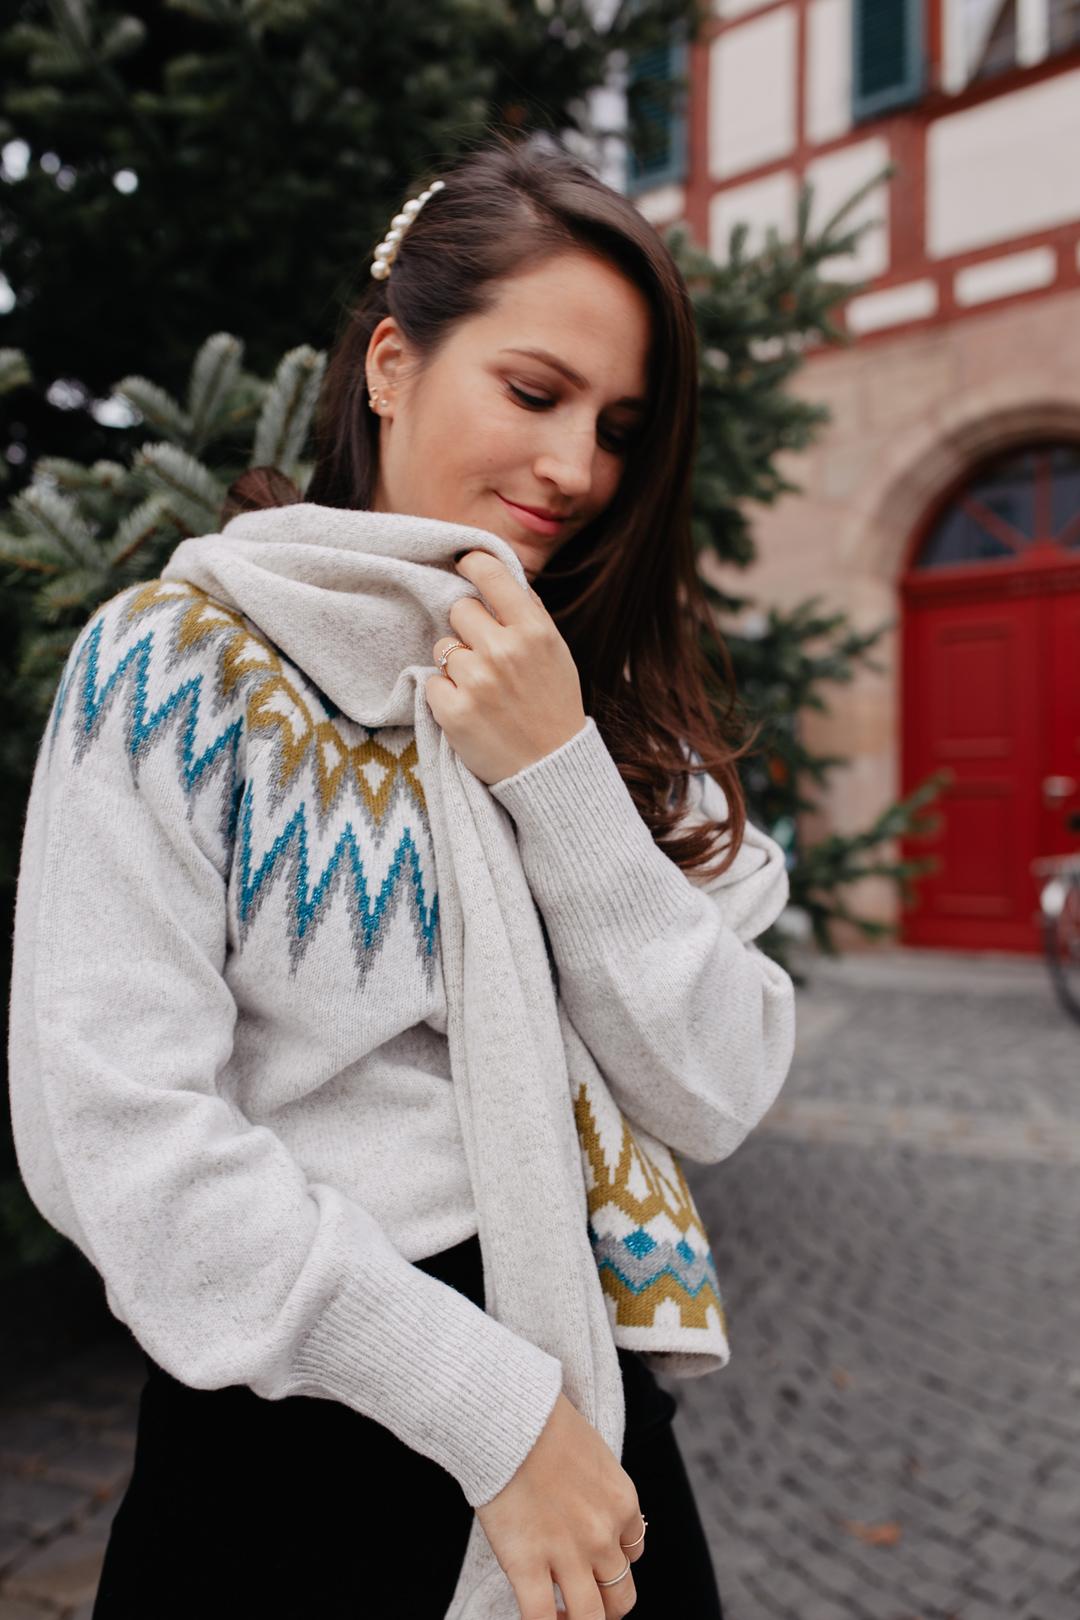 Norwegerpullover kombinieren - Pieces of Mariposa // Fashion & Lifestyle Blog Nürnberg